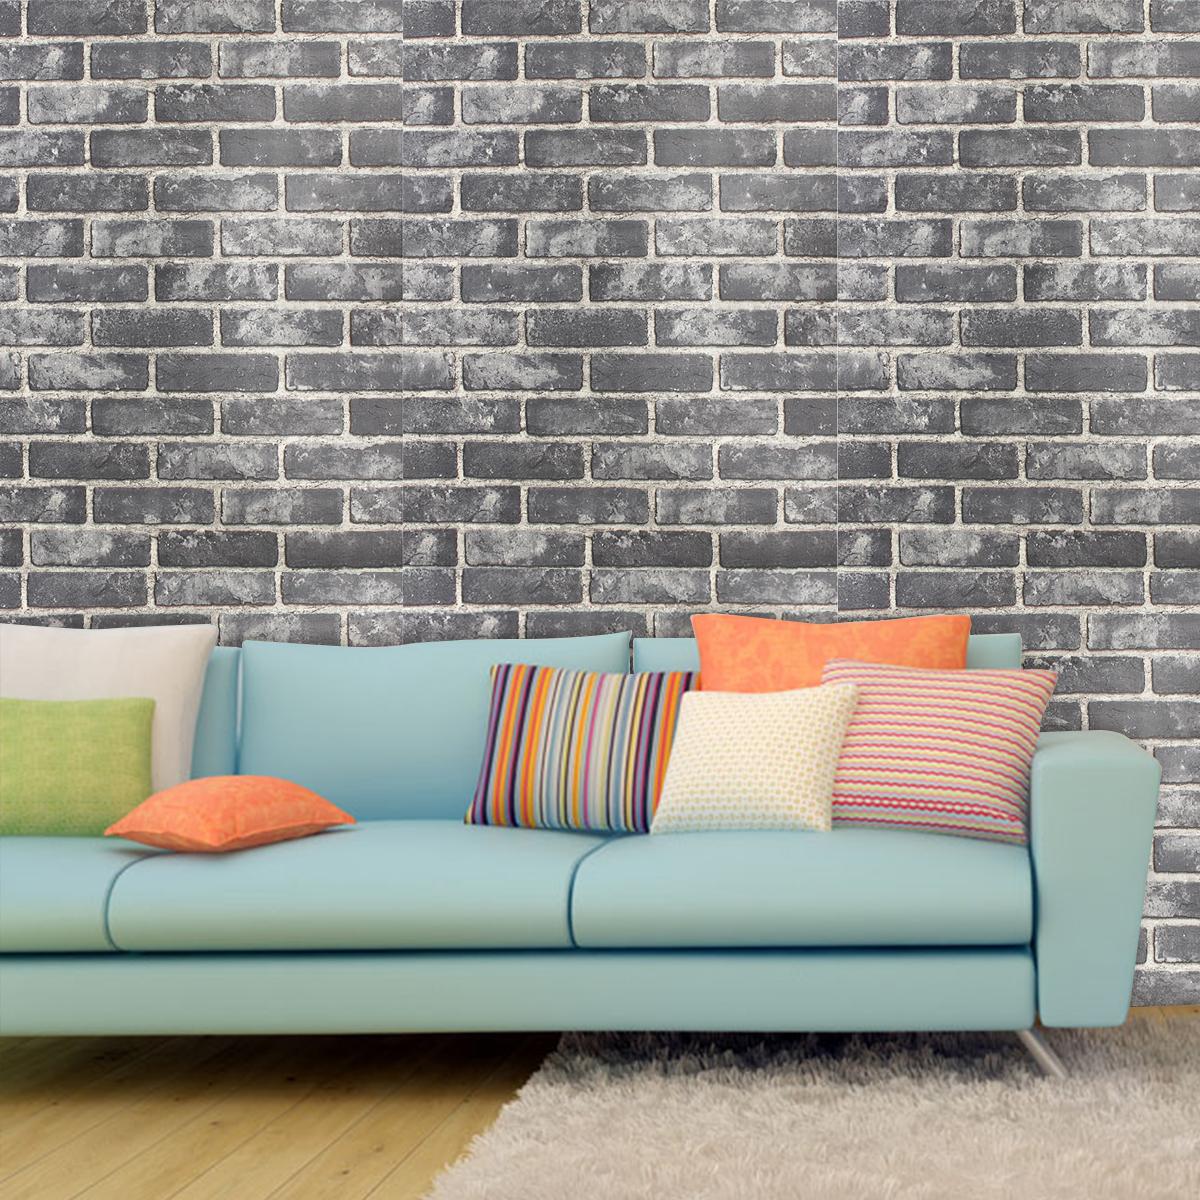 33ft 3D Brick Pattern Effect Wallpaper Bedroom Living Room ...